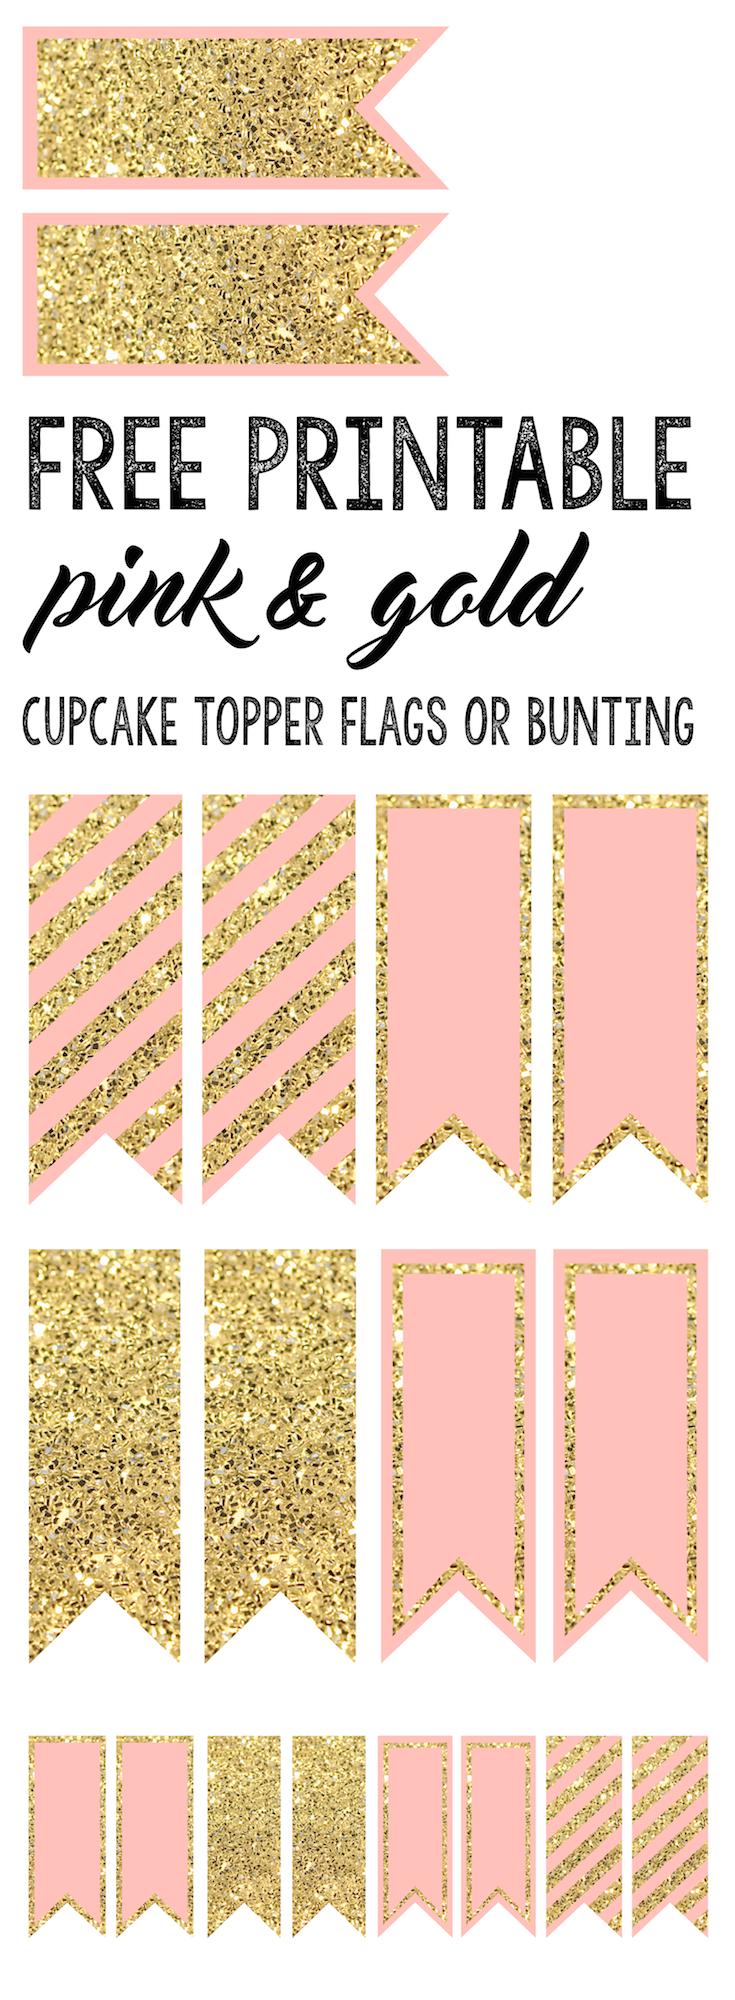 Pink-gold-cupcake-topper-long